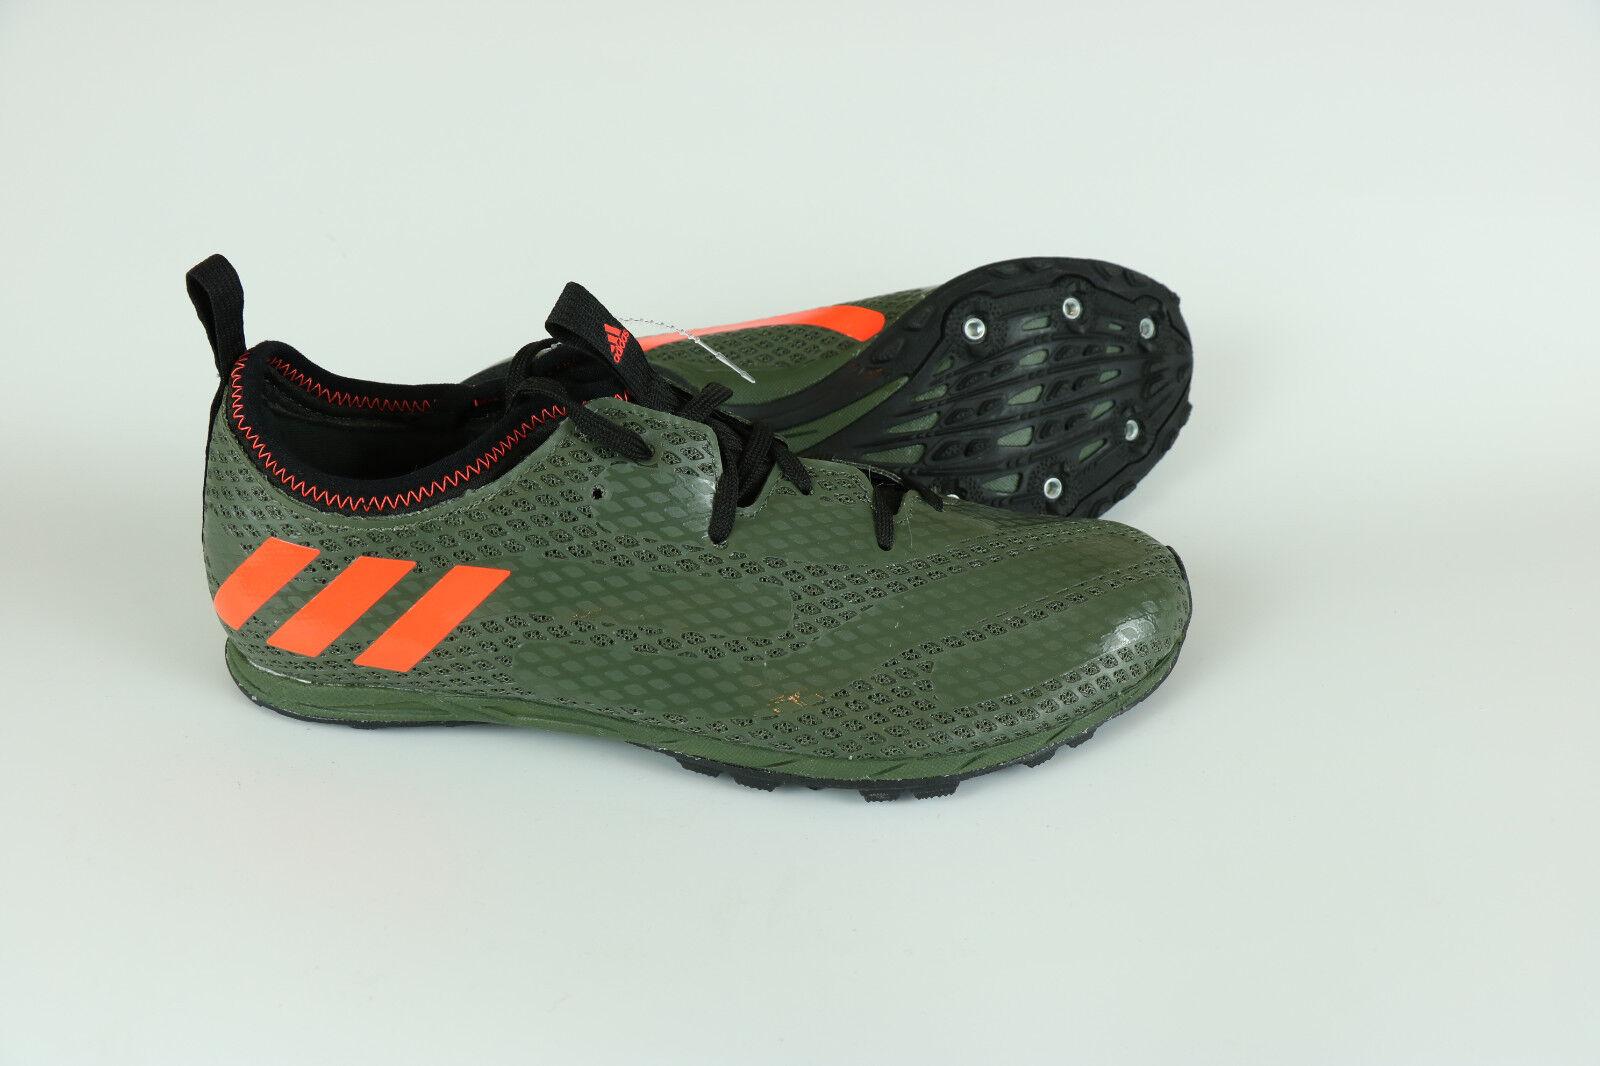 adidas mens spikes track, langlauf schuhe spikes mens ba8387 größe 7,5 a3b2cc